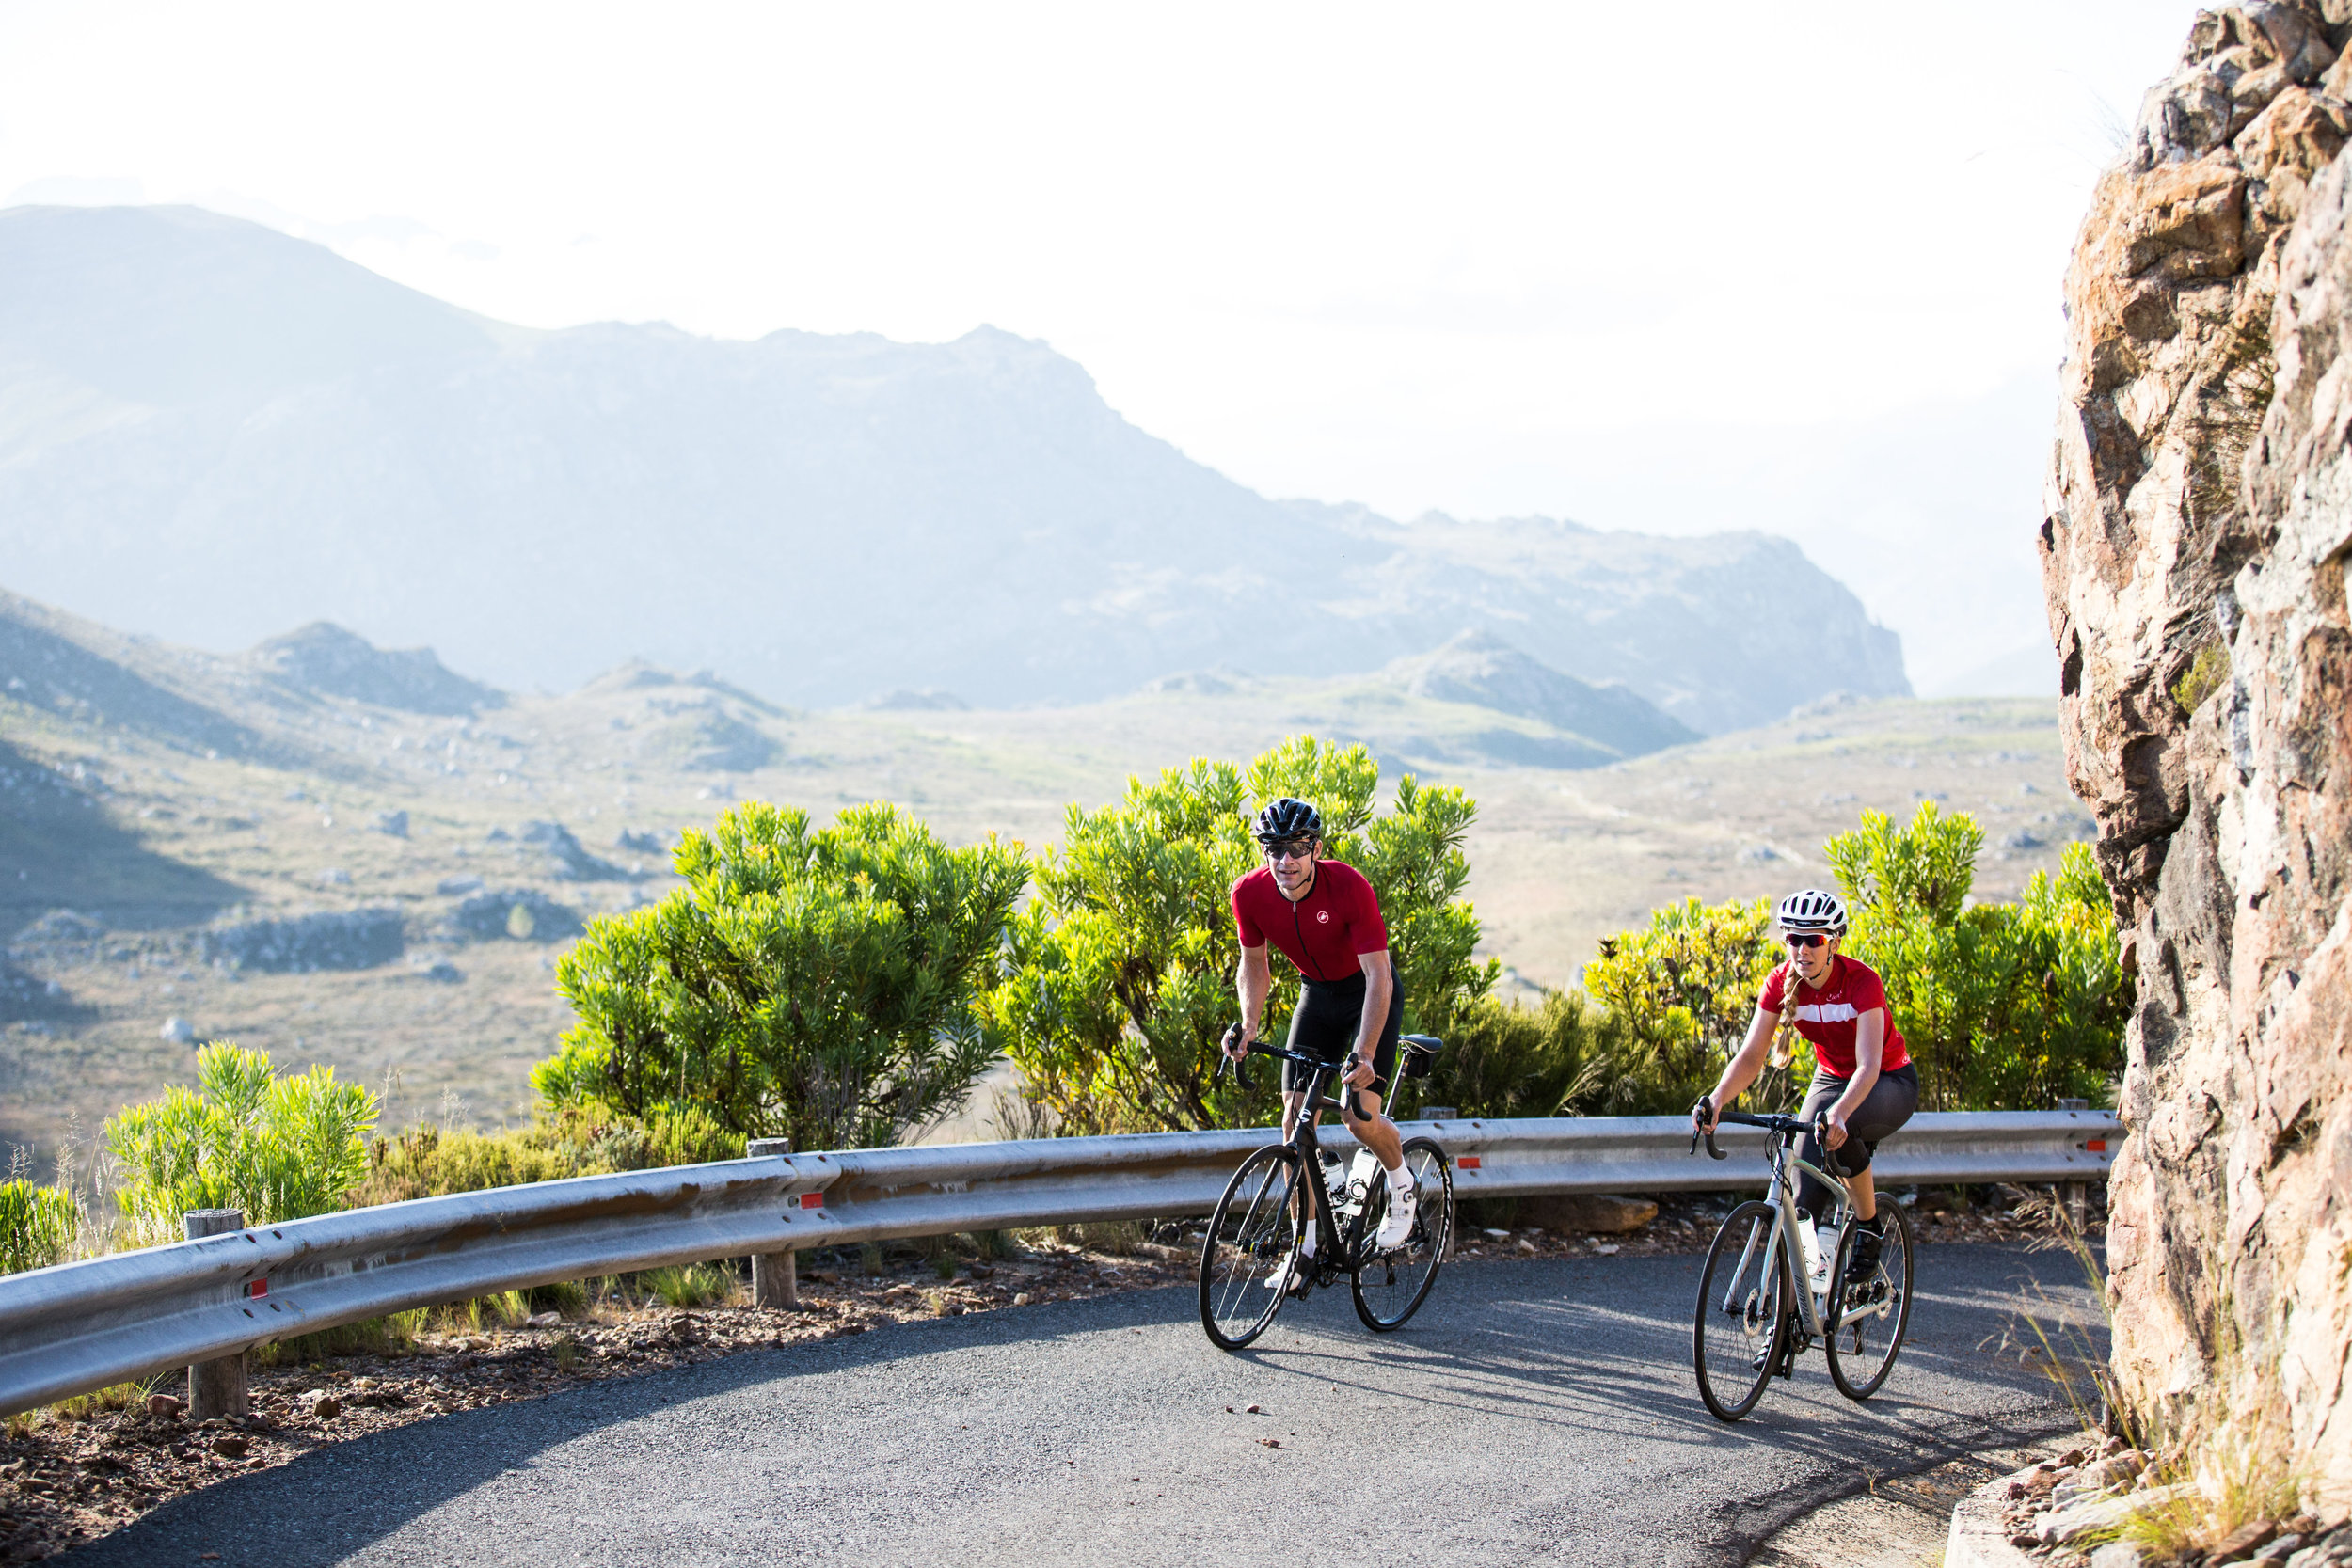 PW_S&R_Day_4_Cycling_Castelli_0012.jpg